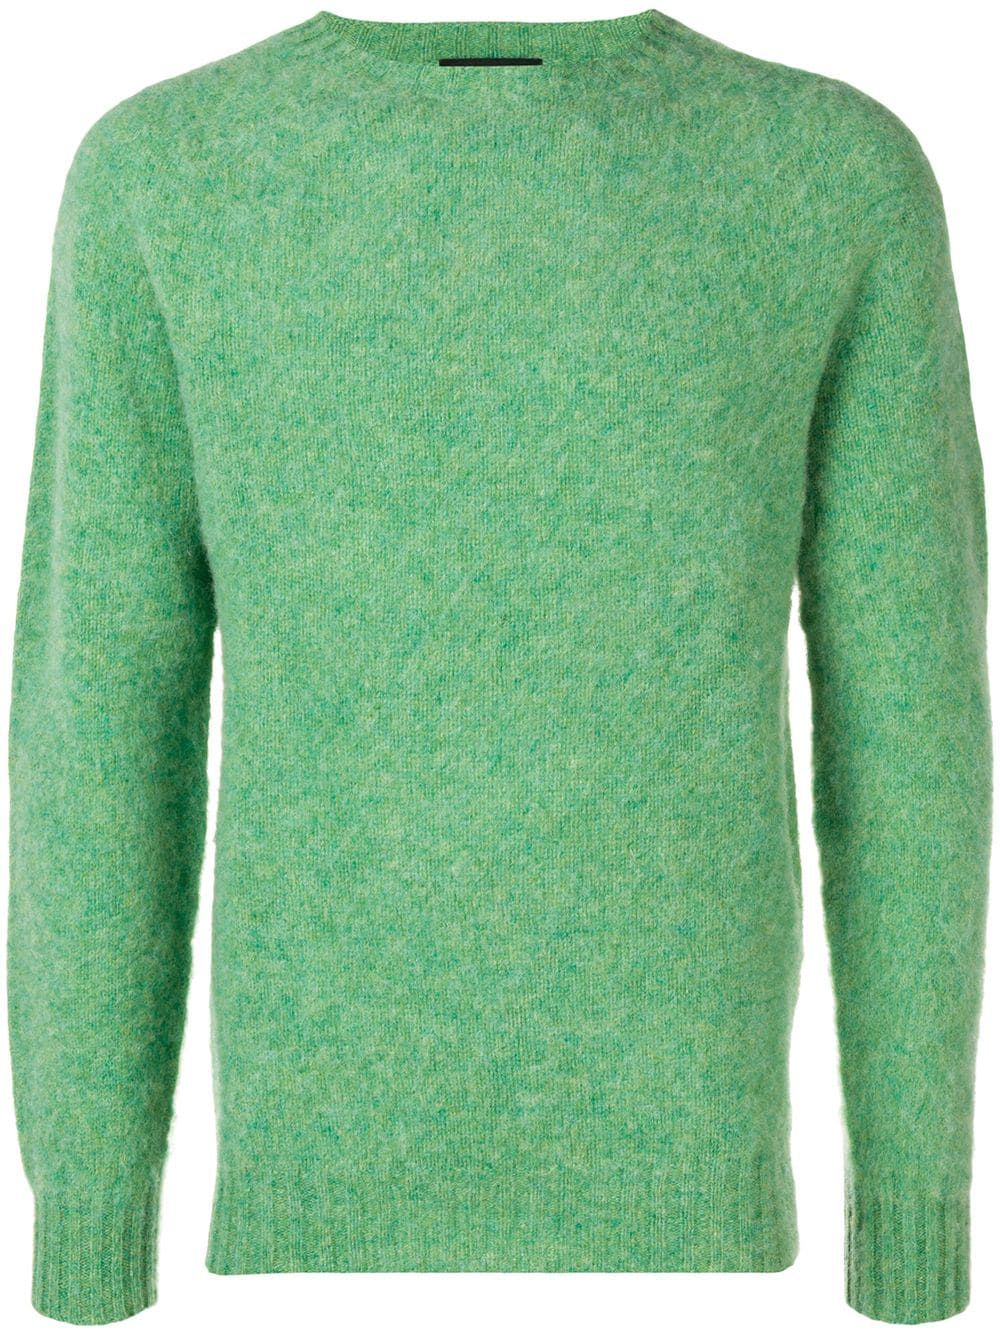 5e73304cd84 HOWLIN' HOWLIN' BIRTH OF THE COOL SWEATER - GREEN. #howlin #cloth ...